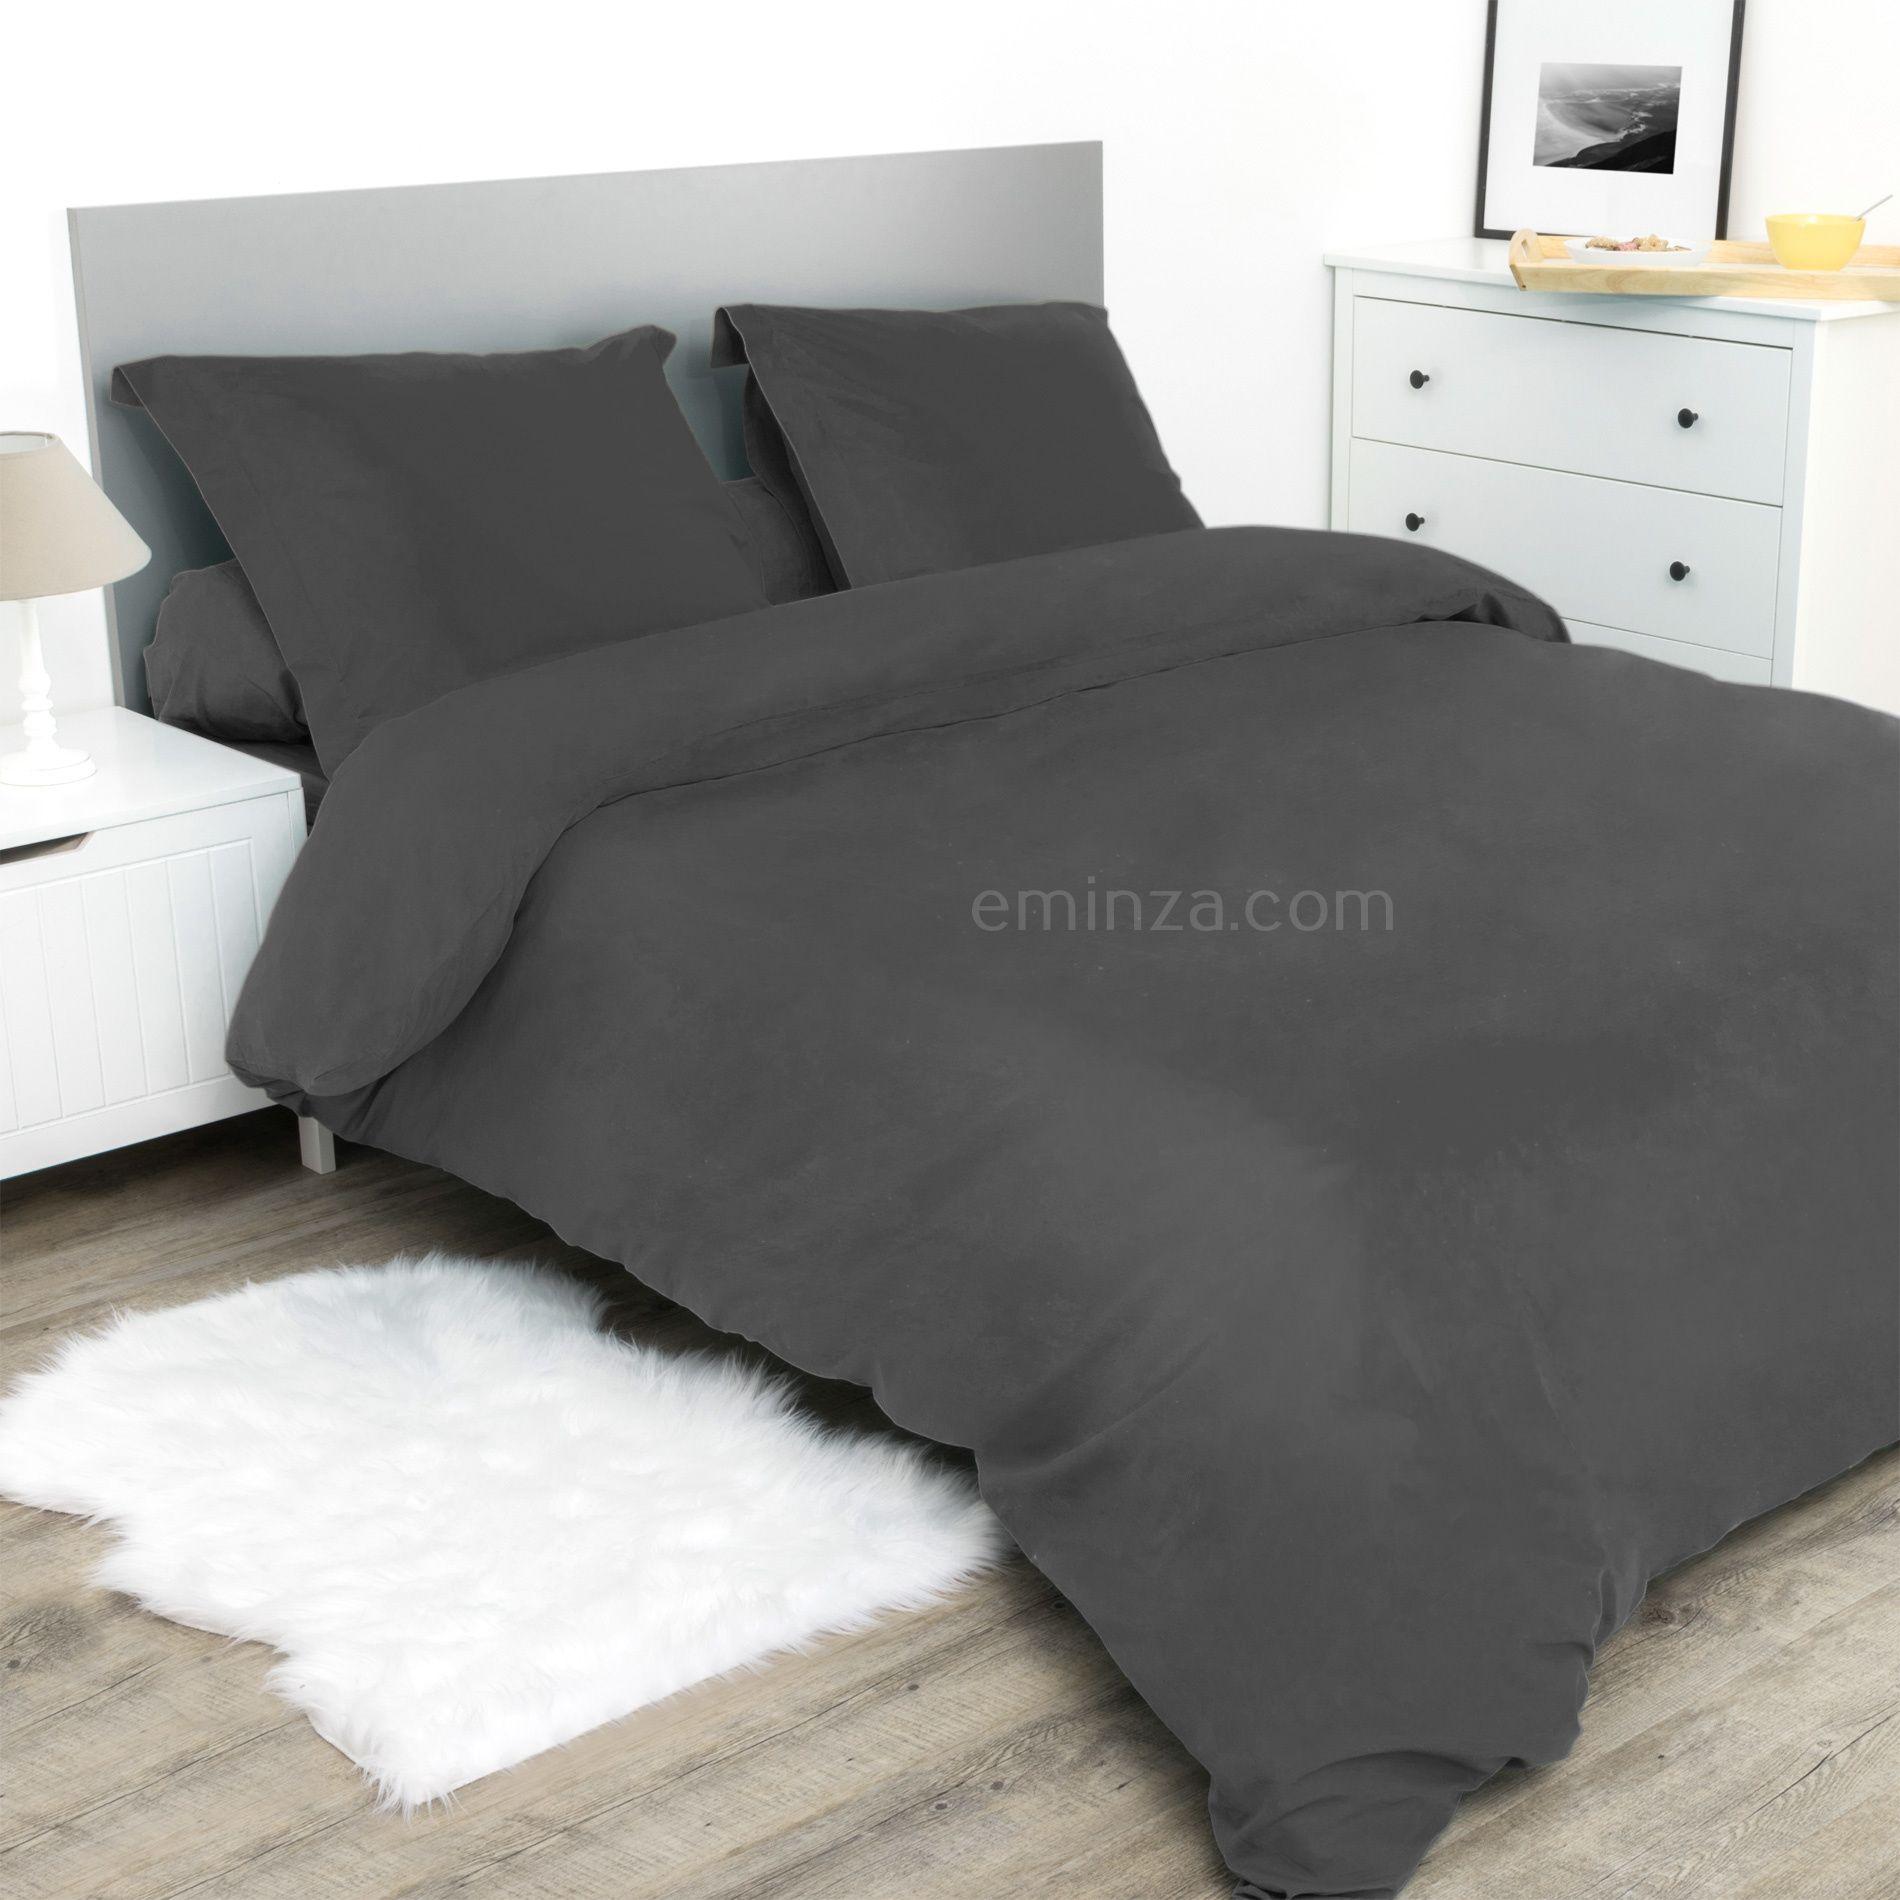 drap housse 160 cm confort anthracite drap housse eminza. Black Bedroom Furniture Sets. Home Design Ideas